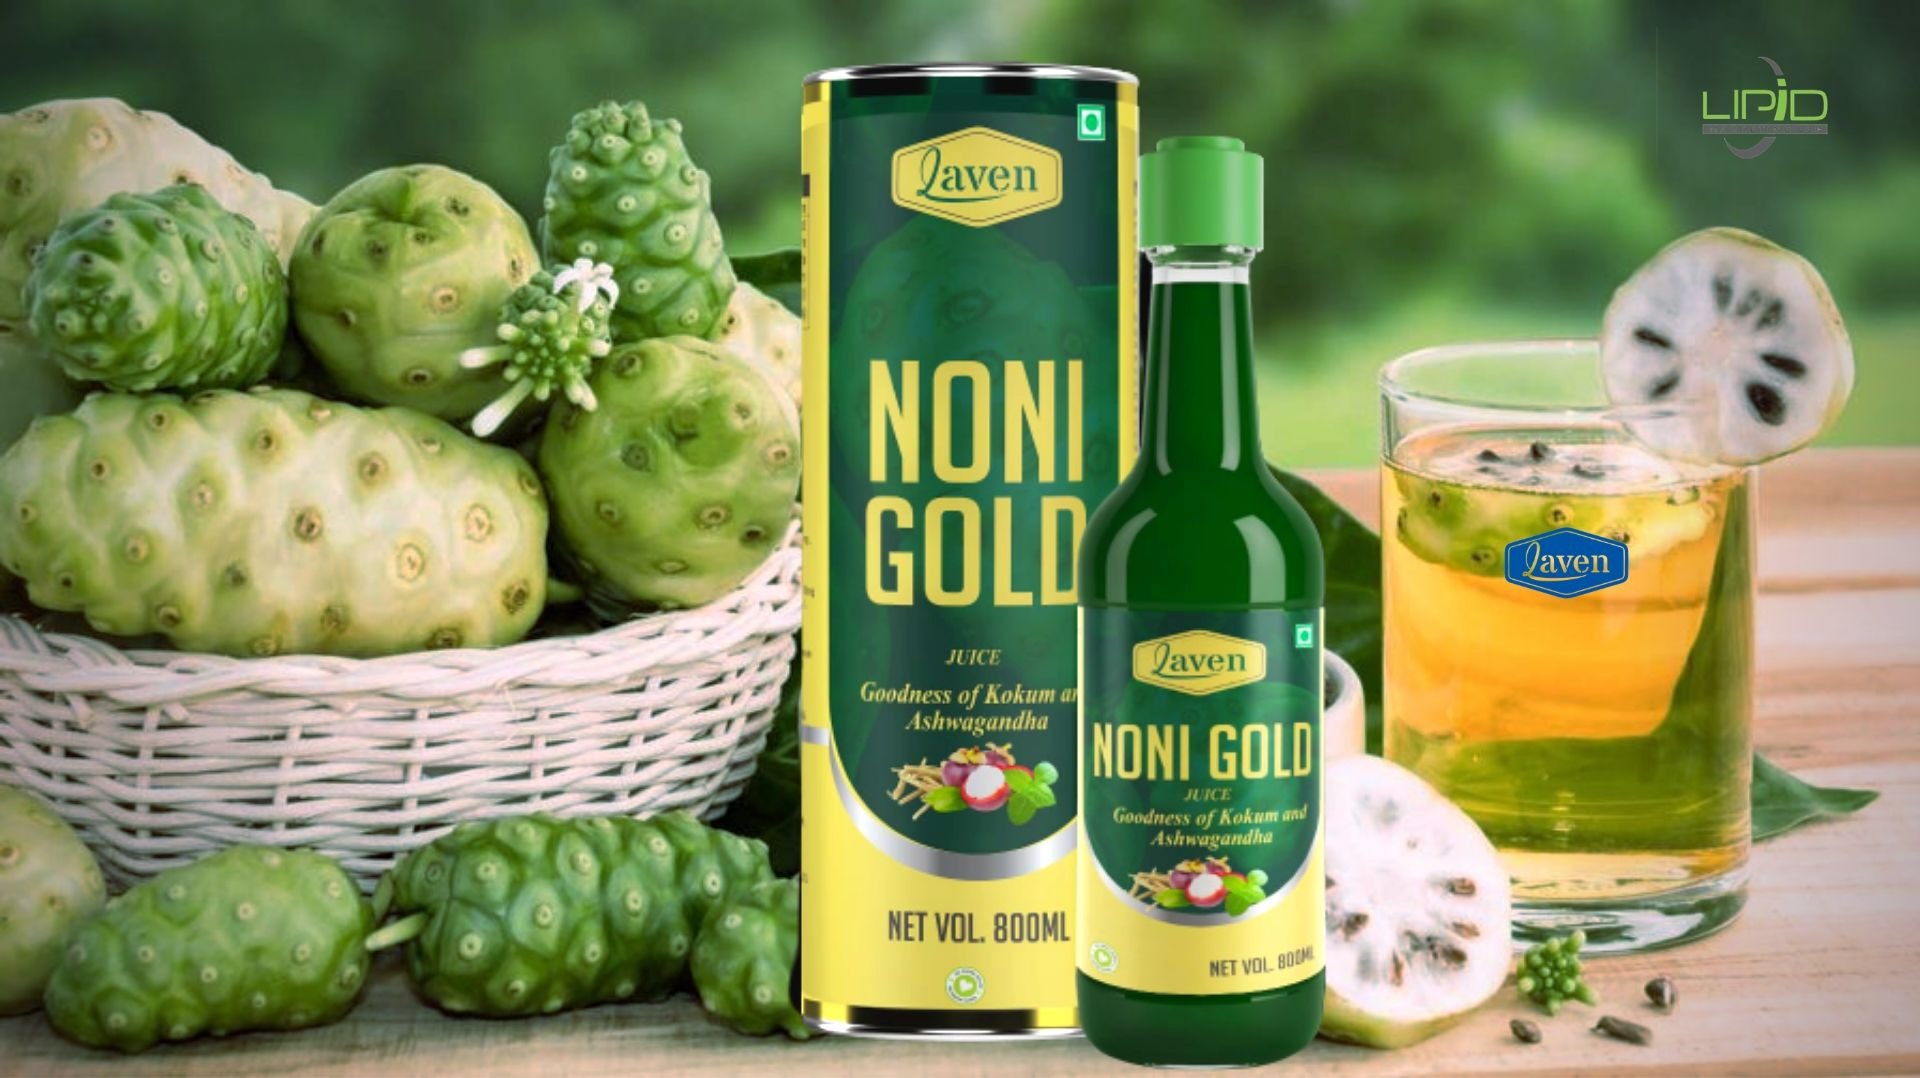 noni juice benefits, nutrition, & dosage - what is noni